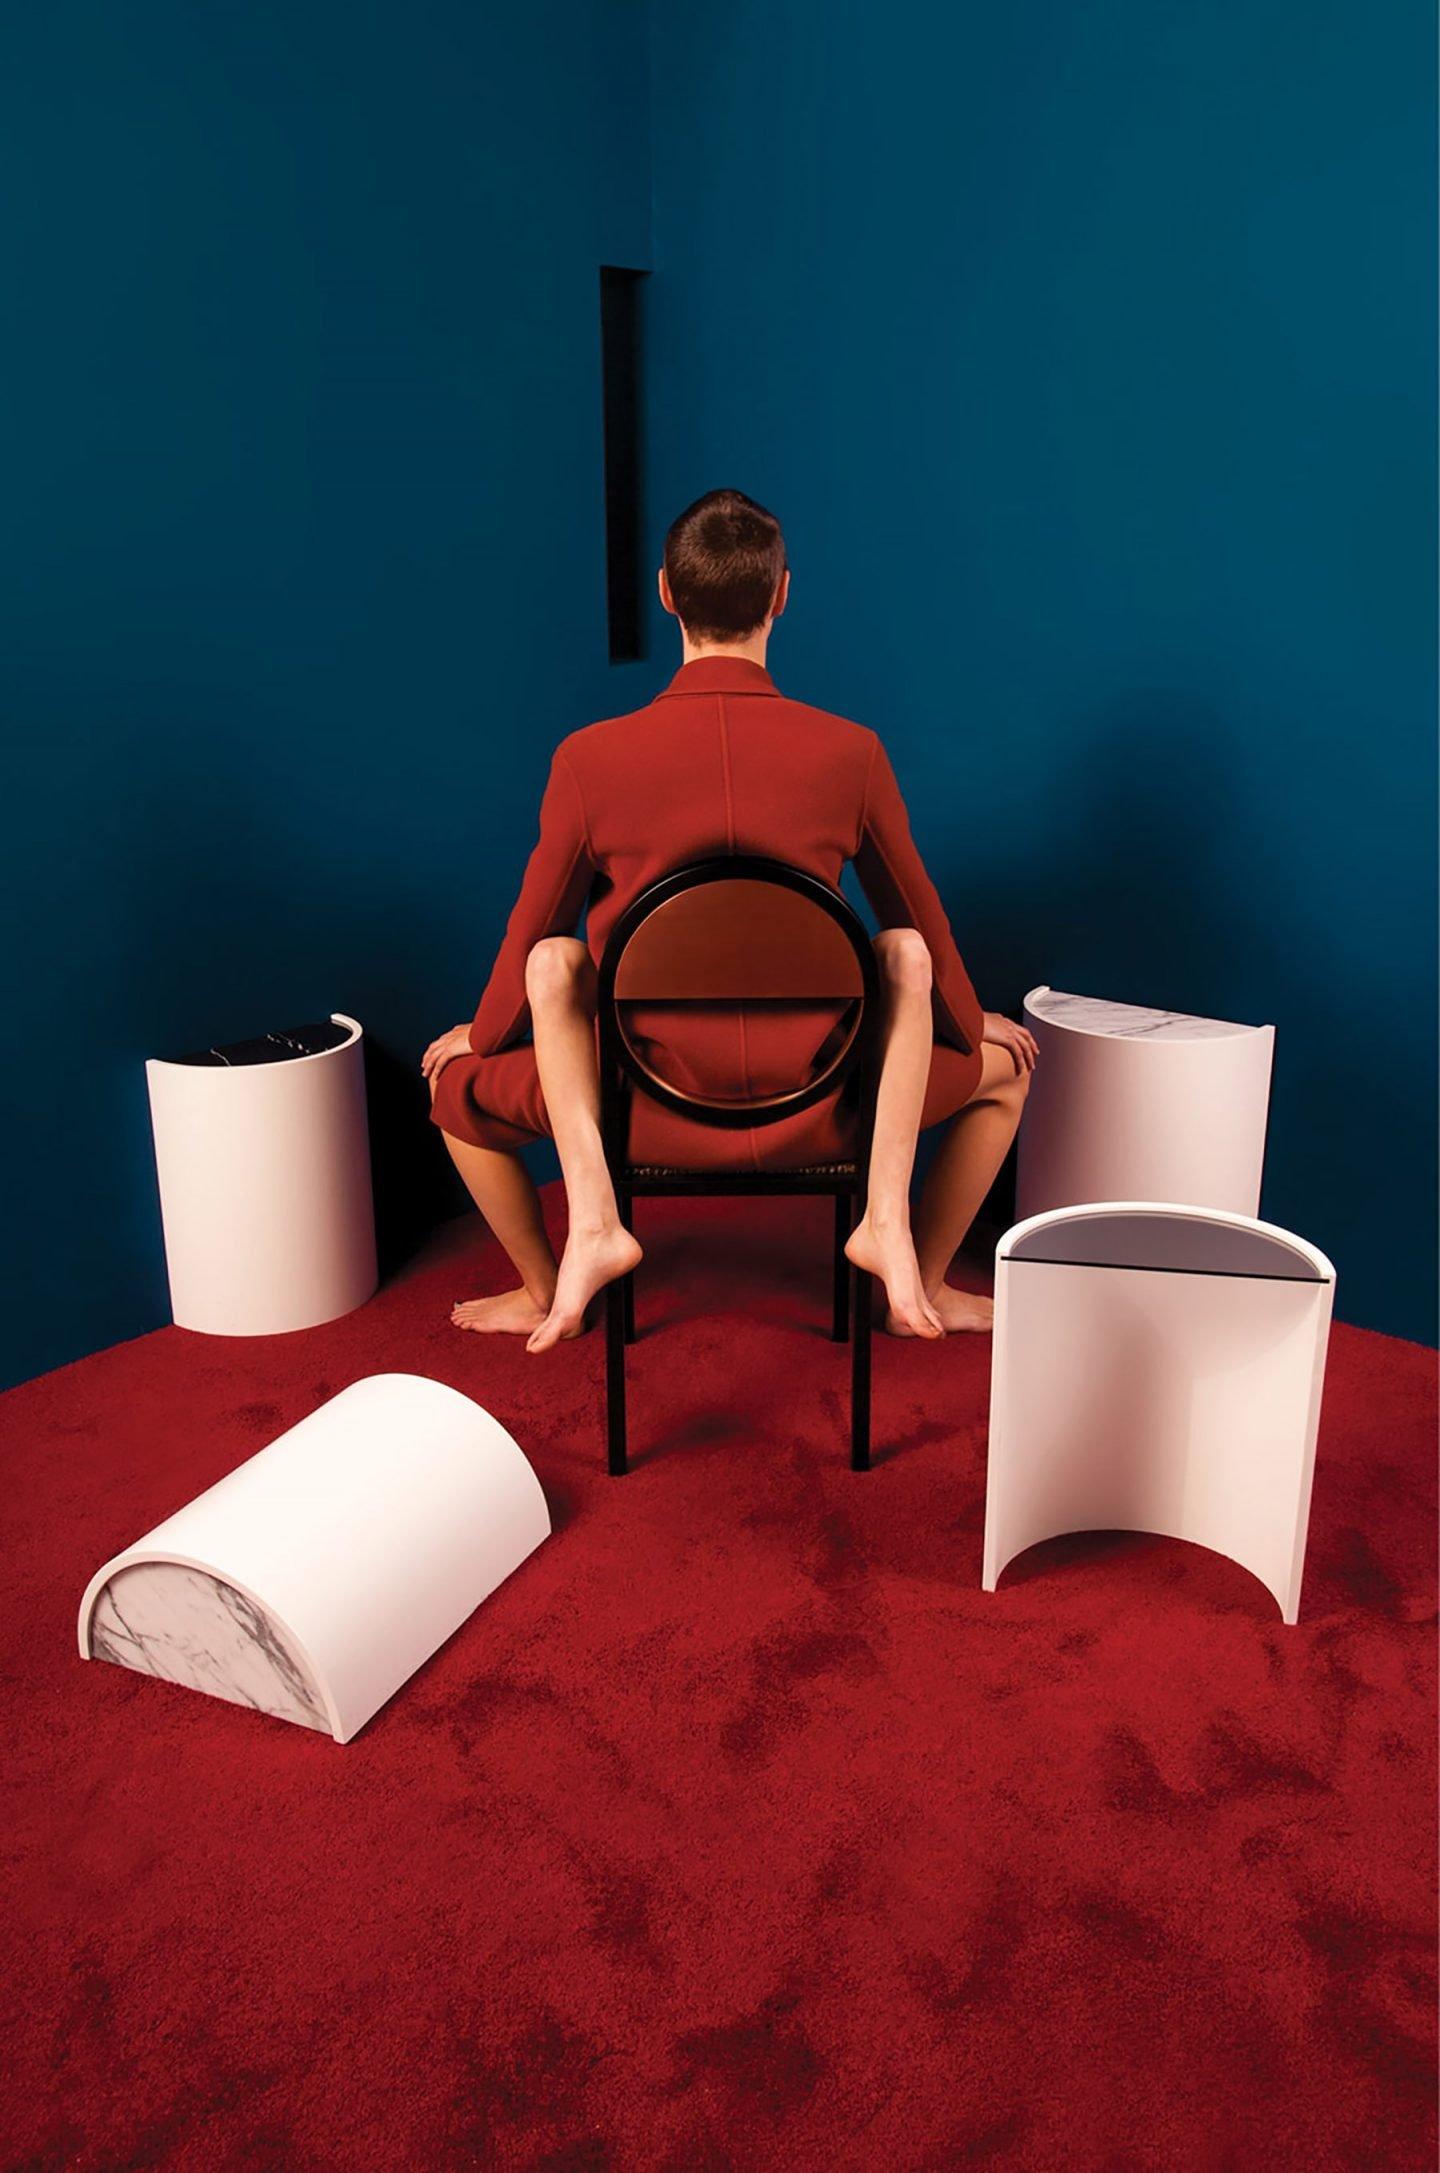 iGNANT-Art-Bower-x-Blaise-Cepis-03